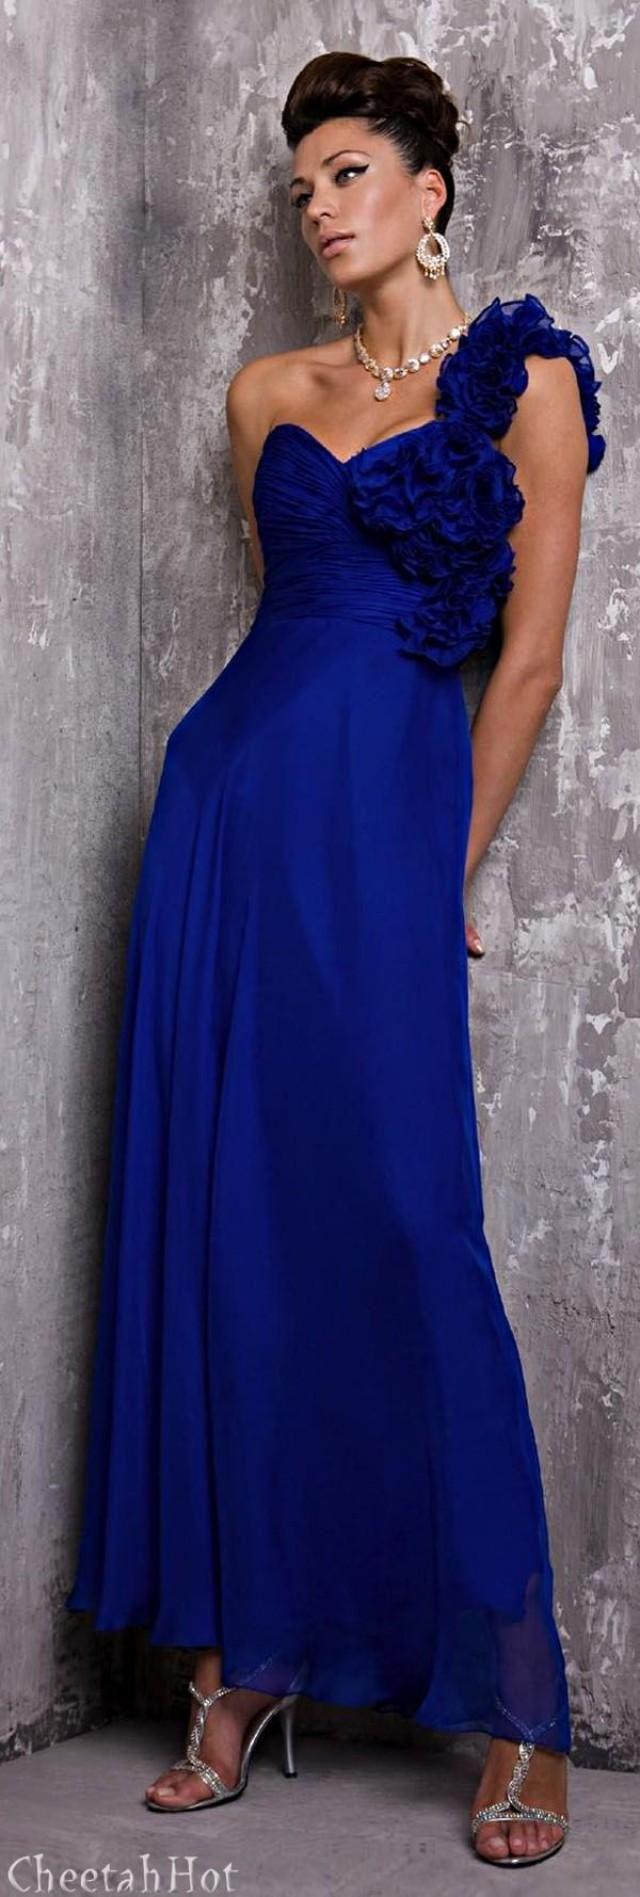 JOVANI - Royal Blue Gown blue